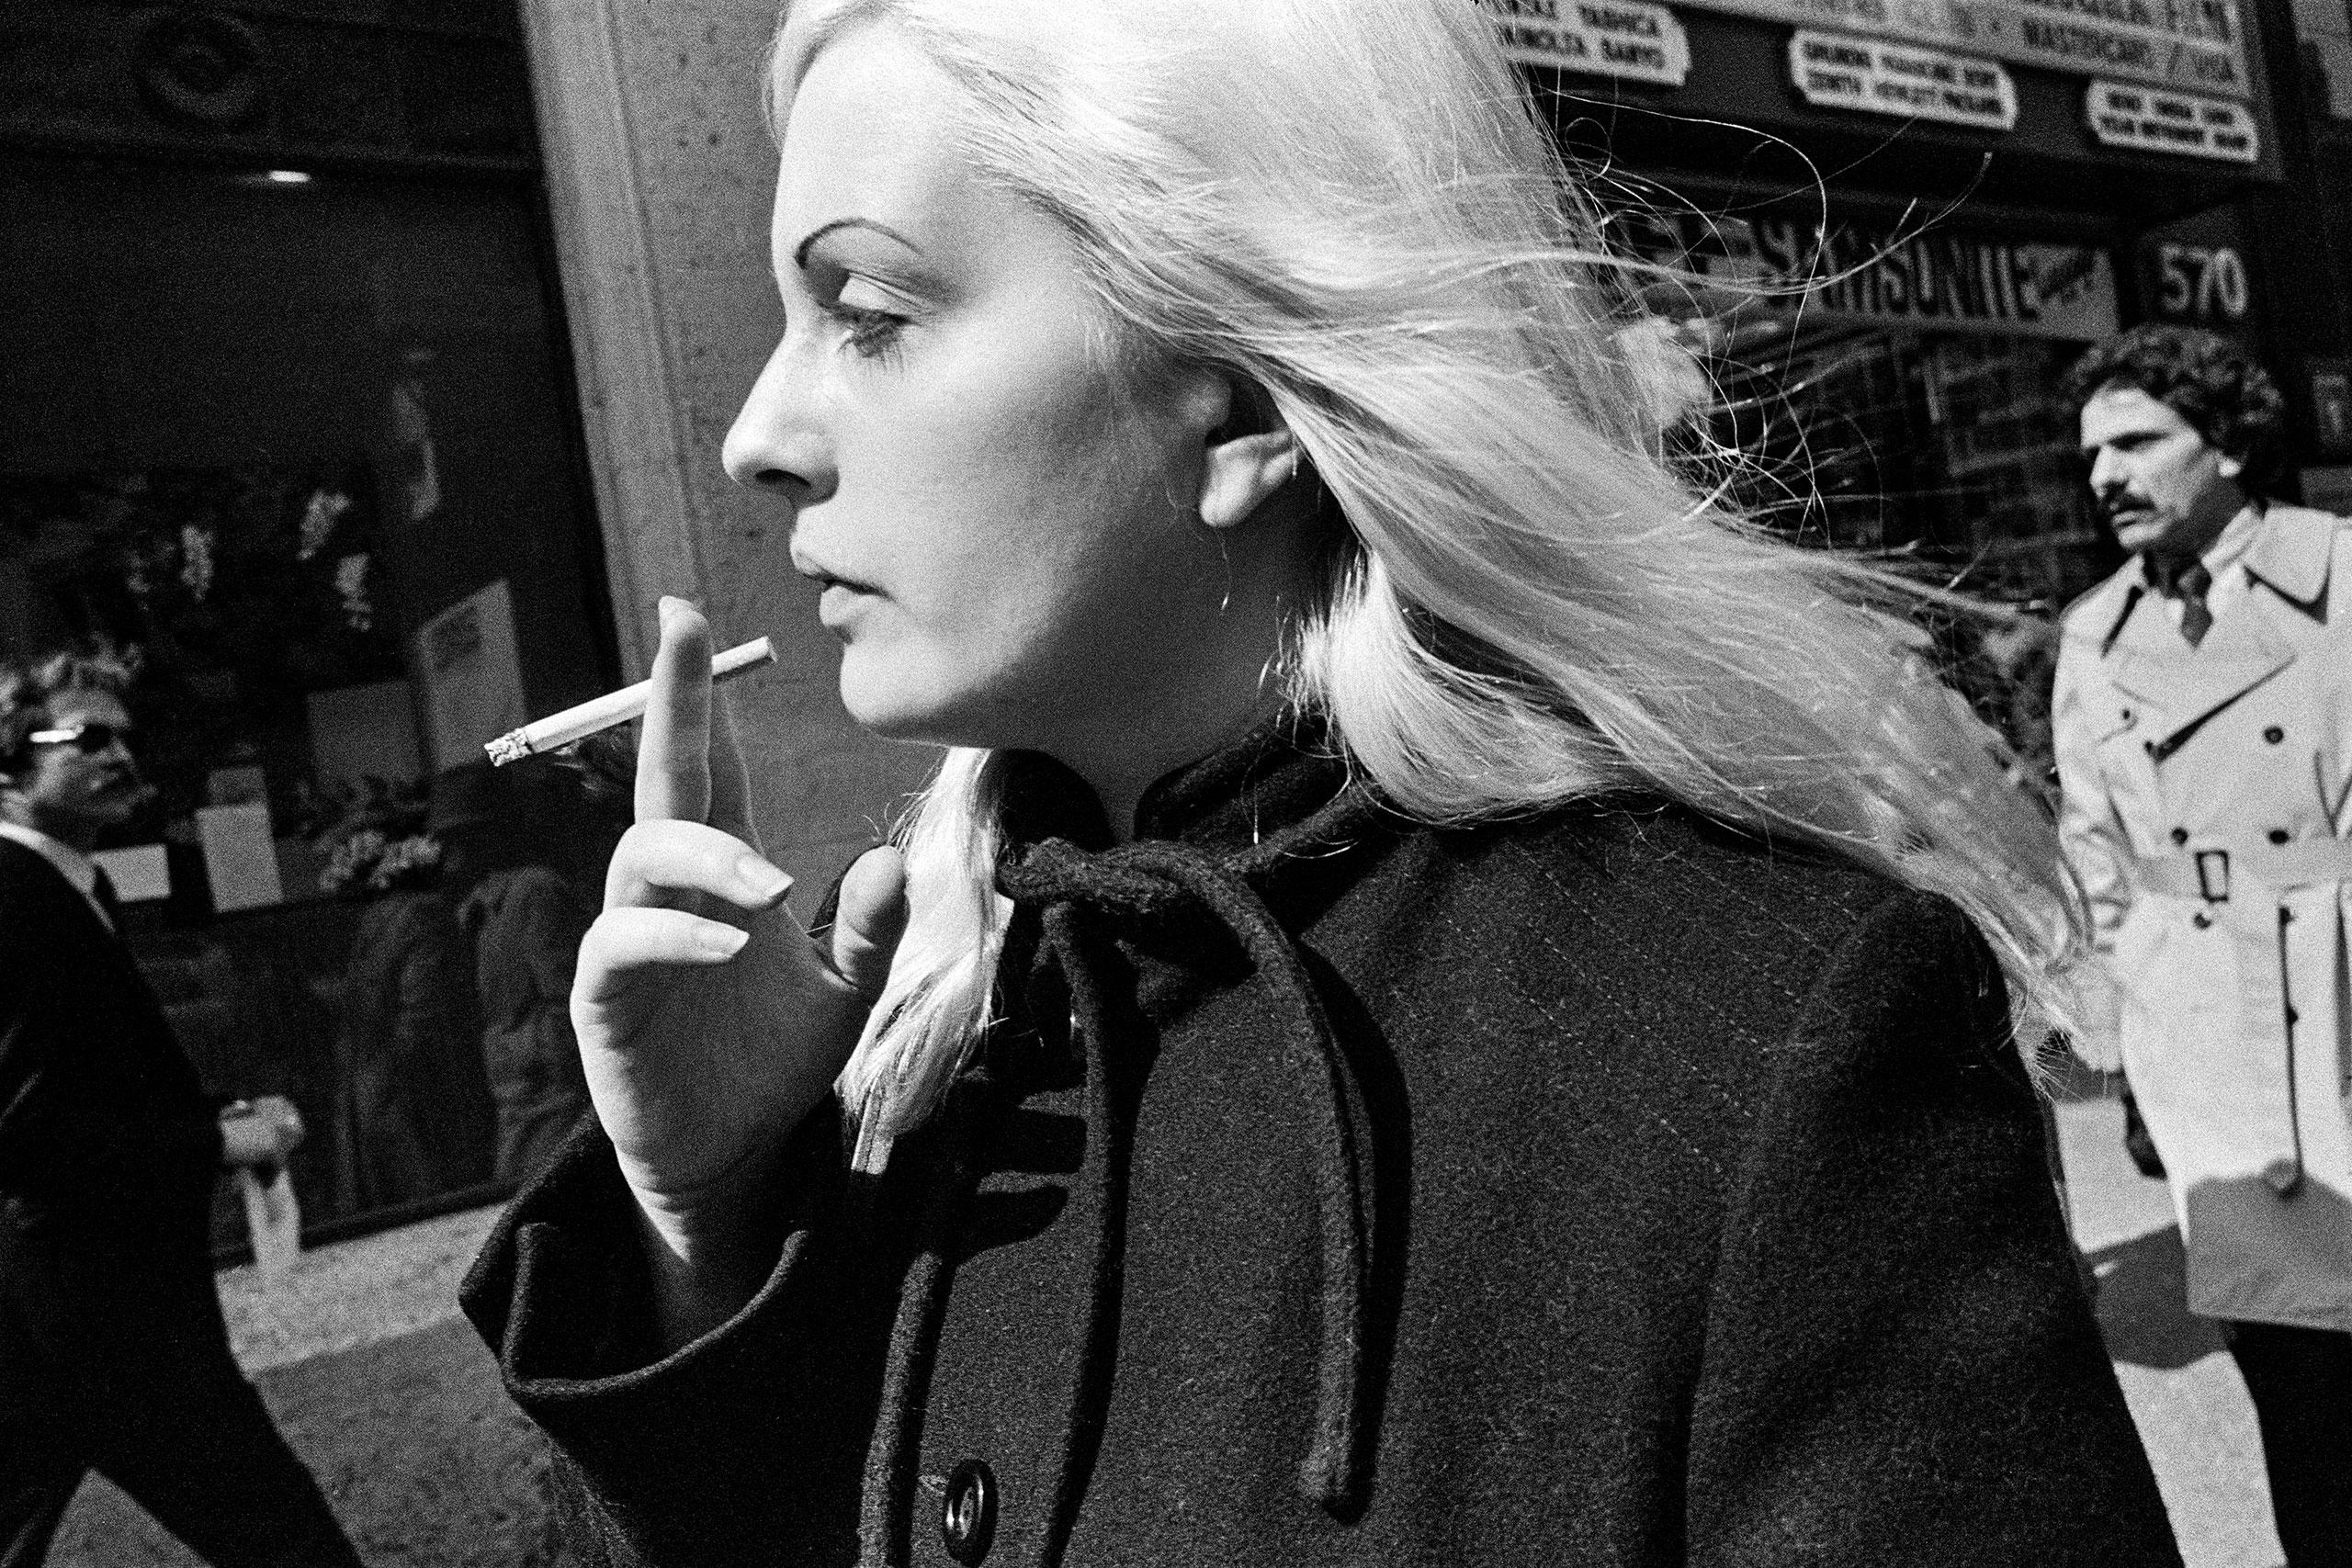 Woman, Angled Cig, 5th Ave., NYC, 1981